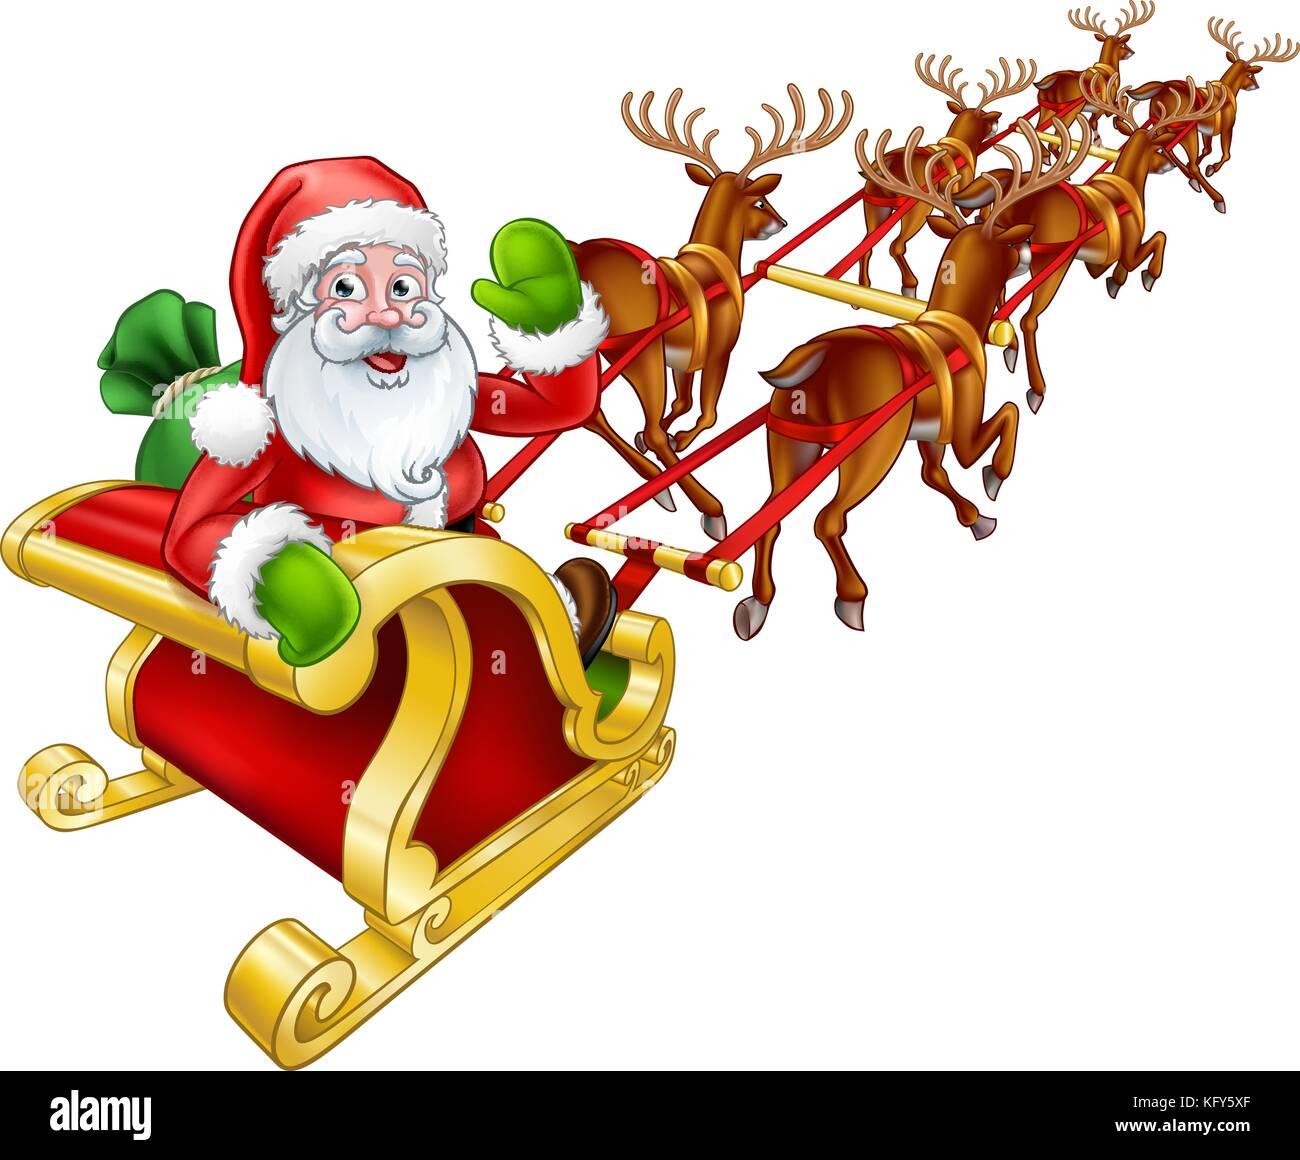 Santa Claus Christmas Reindeer and Sled Sleigh  - Stock Image